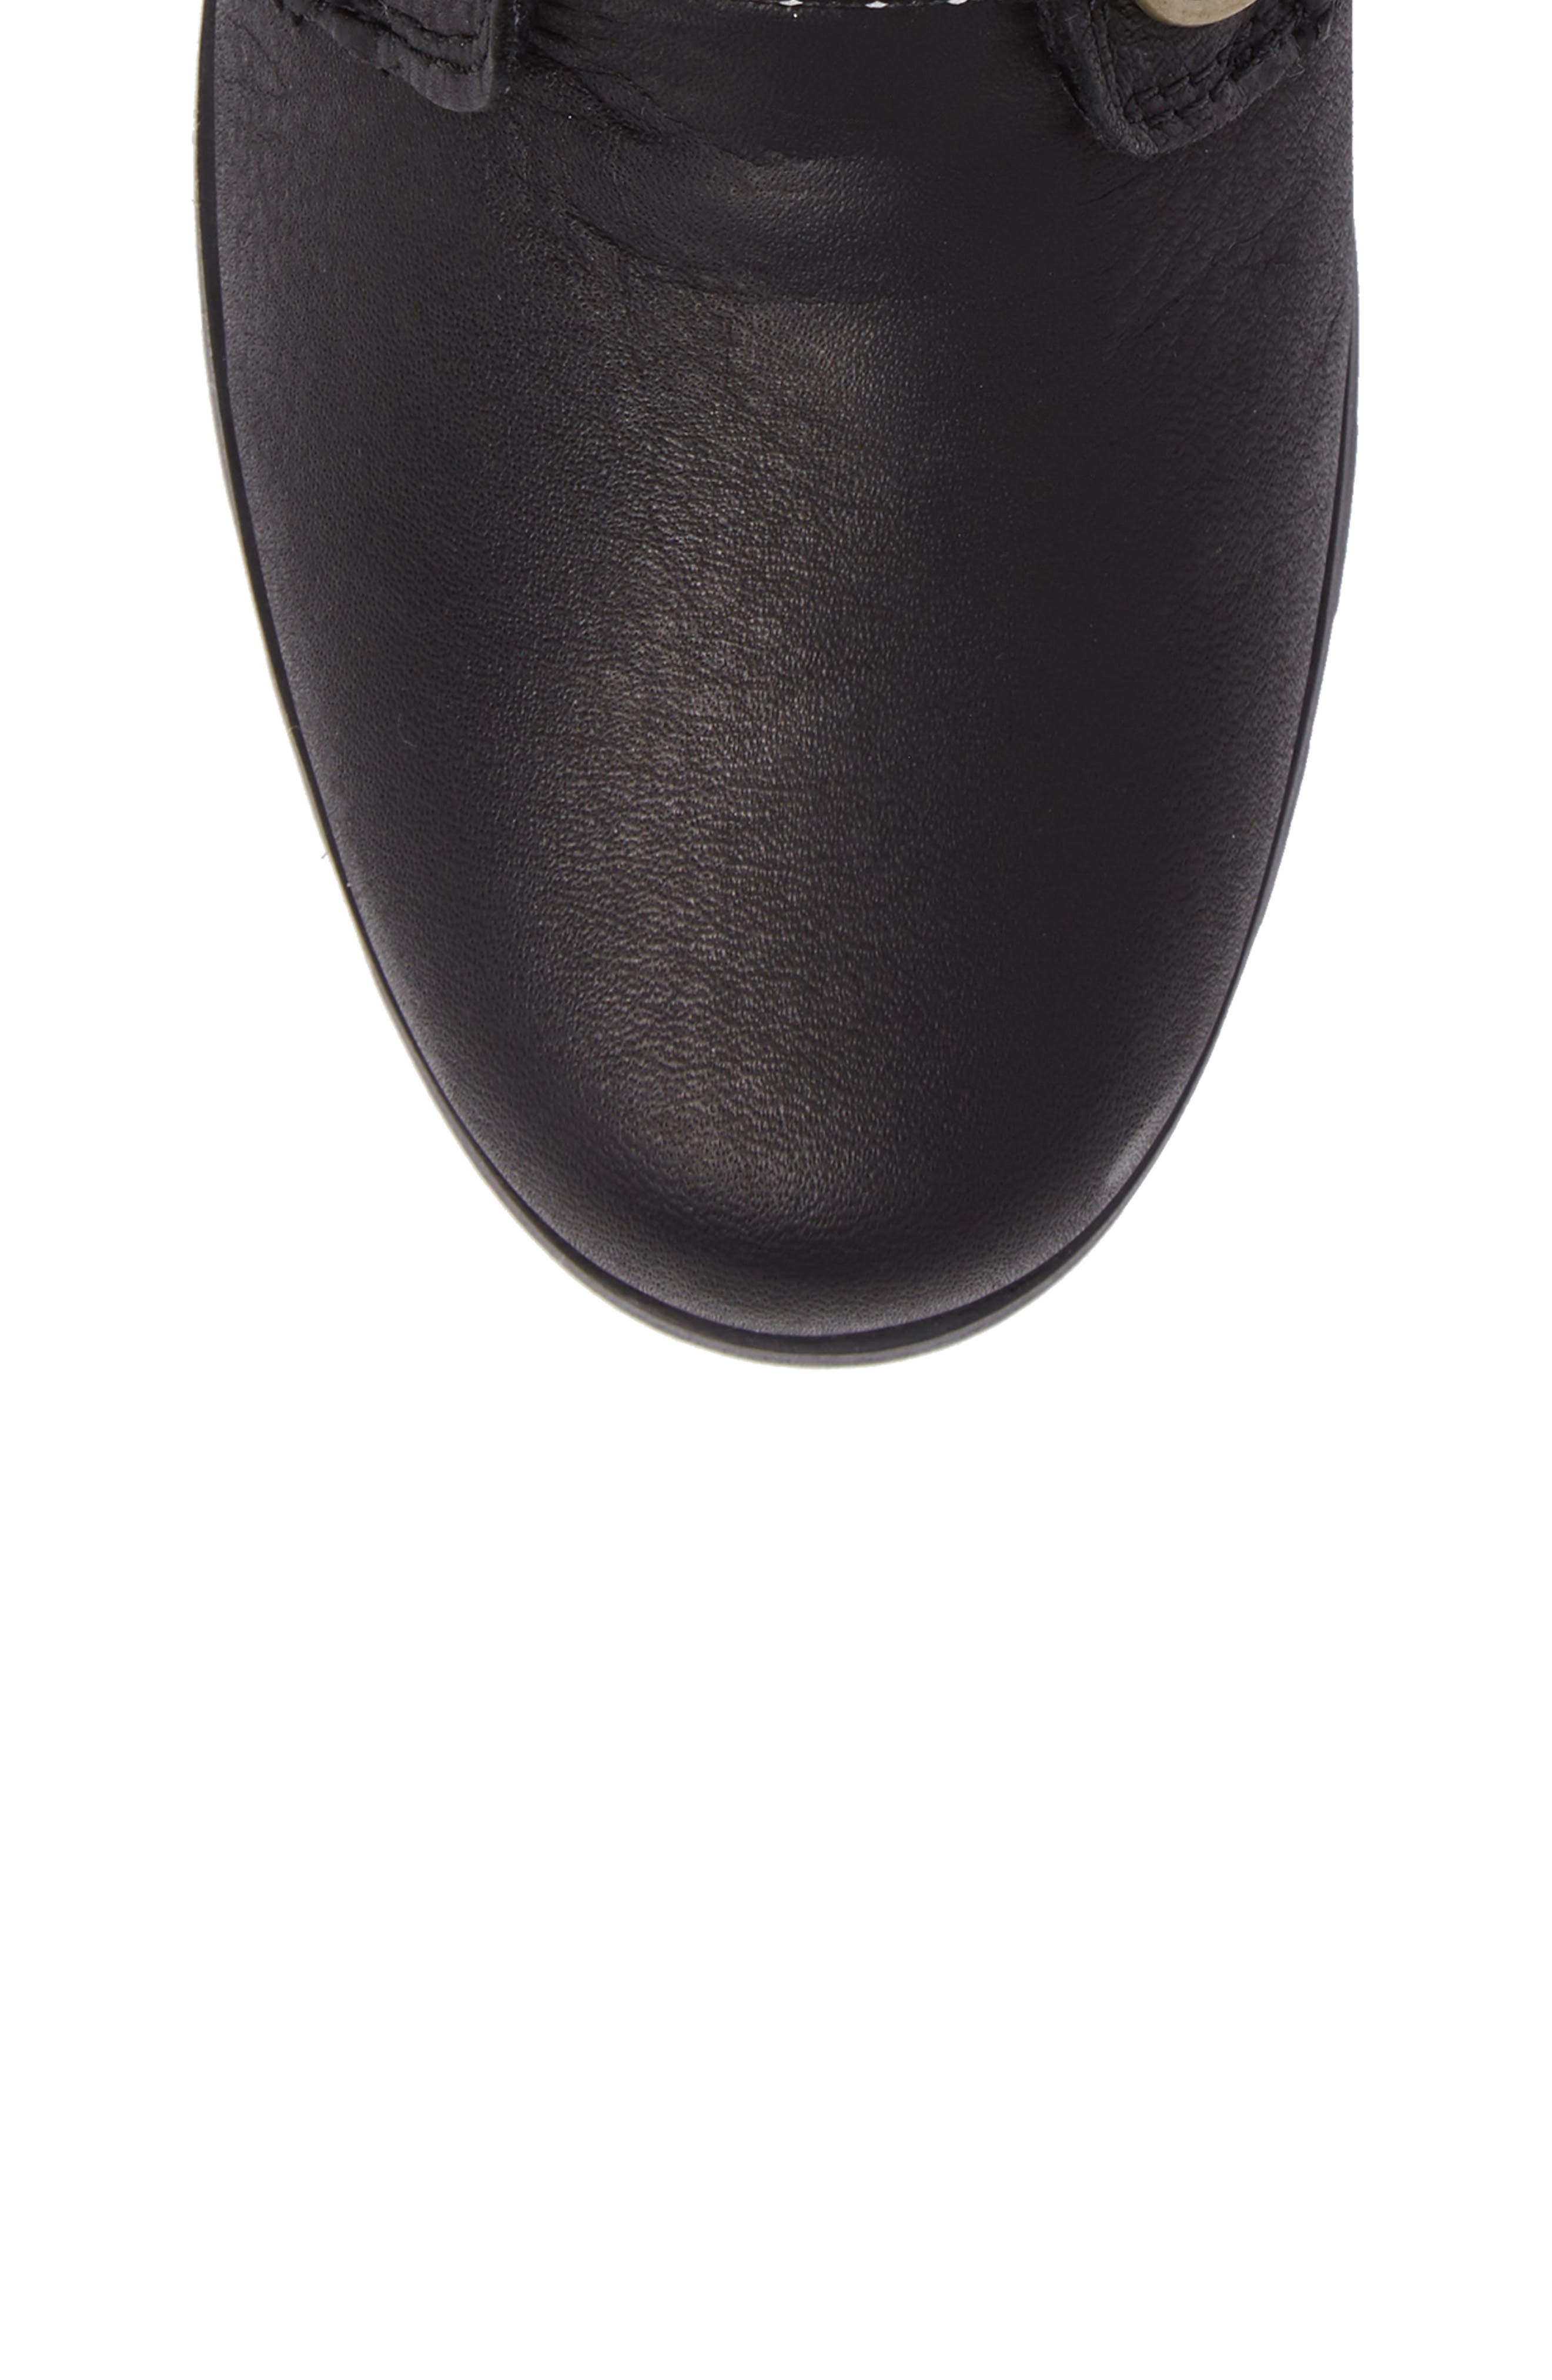 Emelie Waterproof Lace Up Boot with Faux Fur Trim,                             Alternate thumbnail 5, color,                             Black